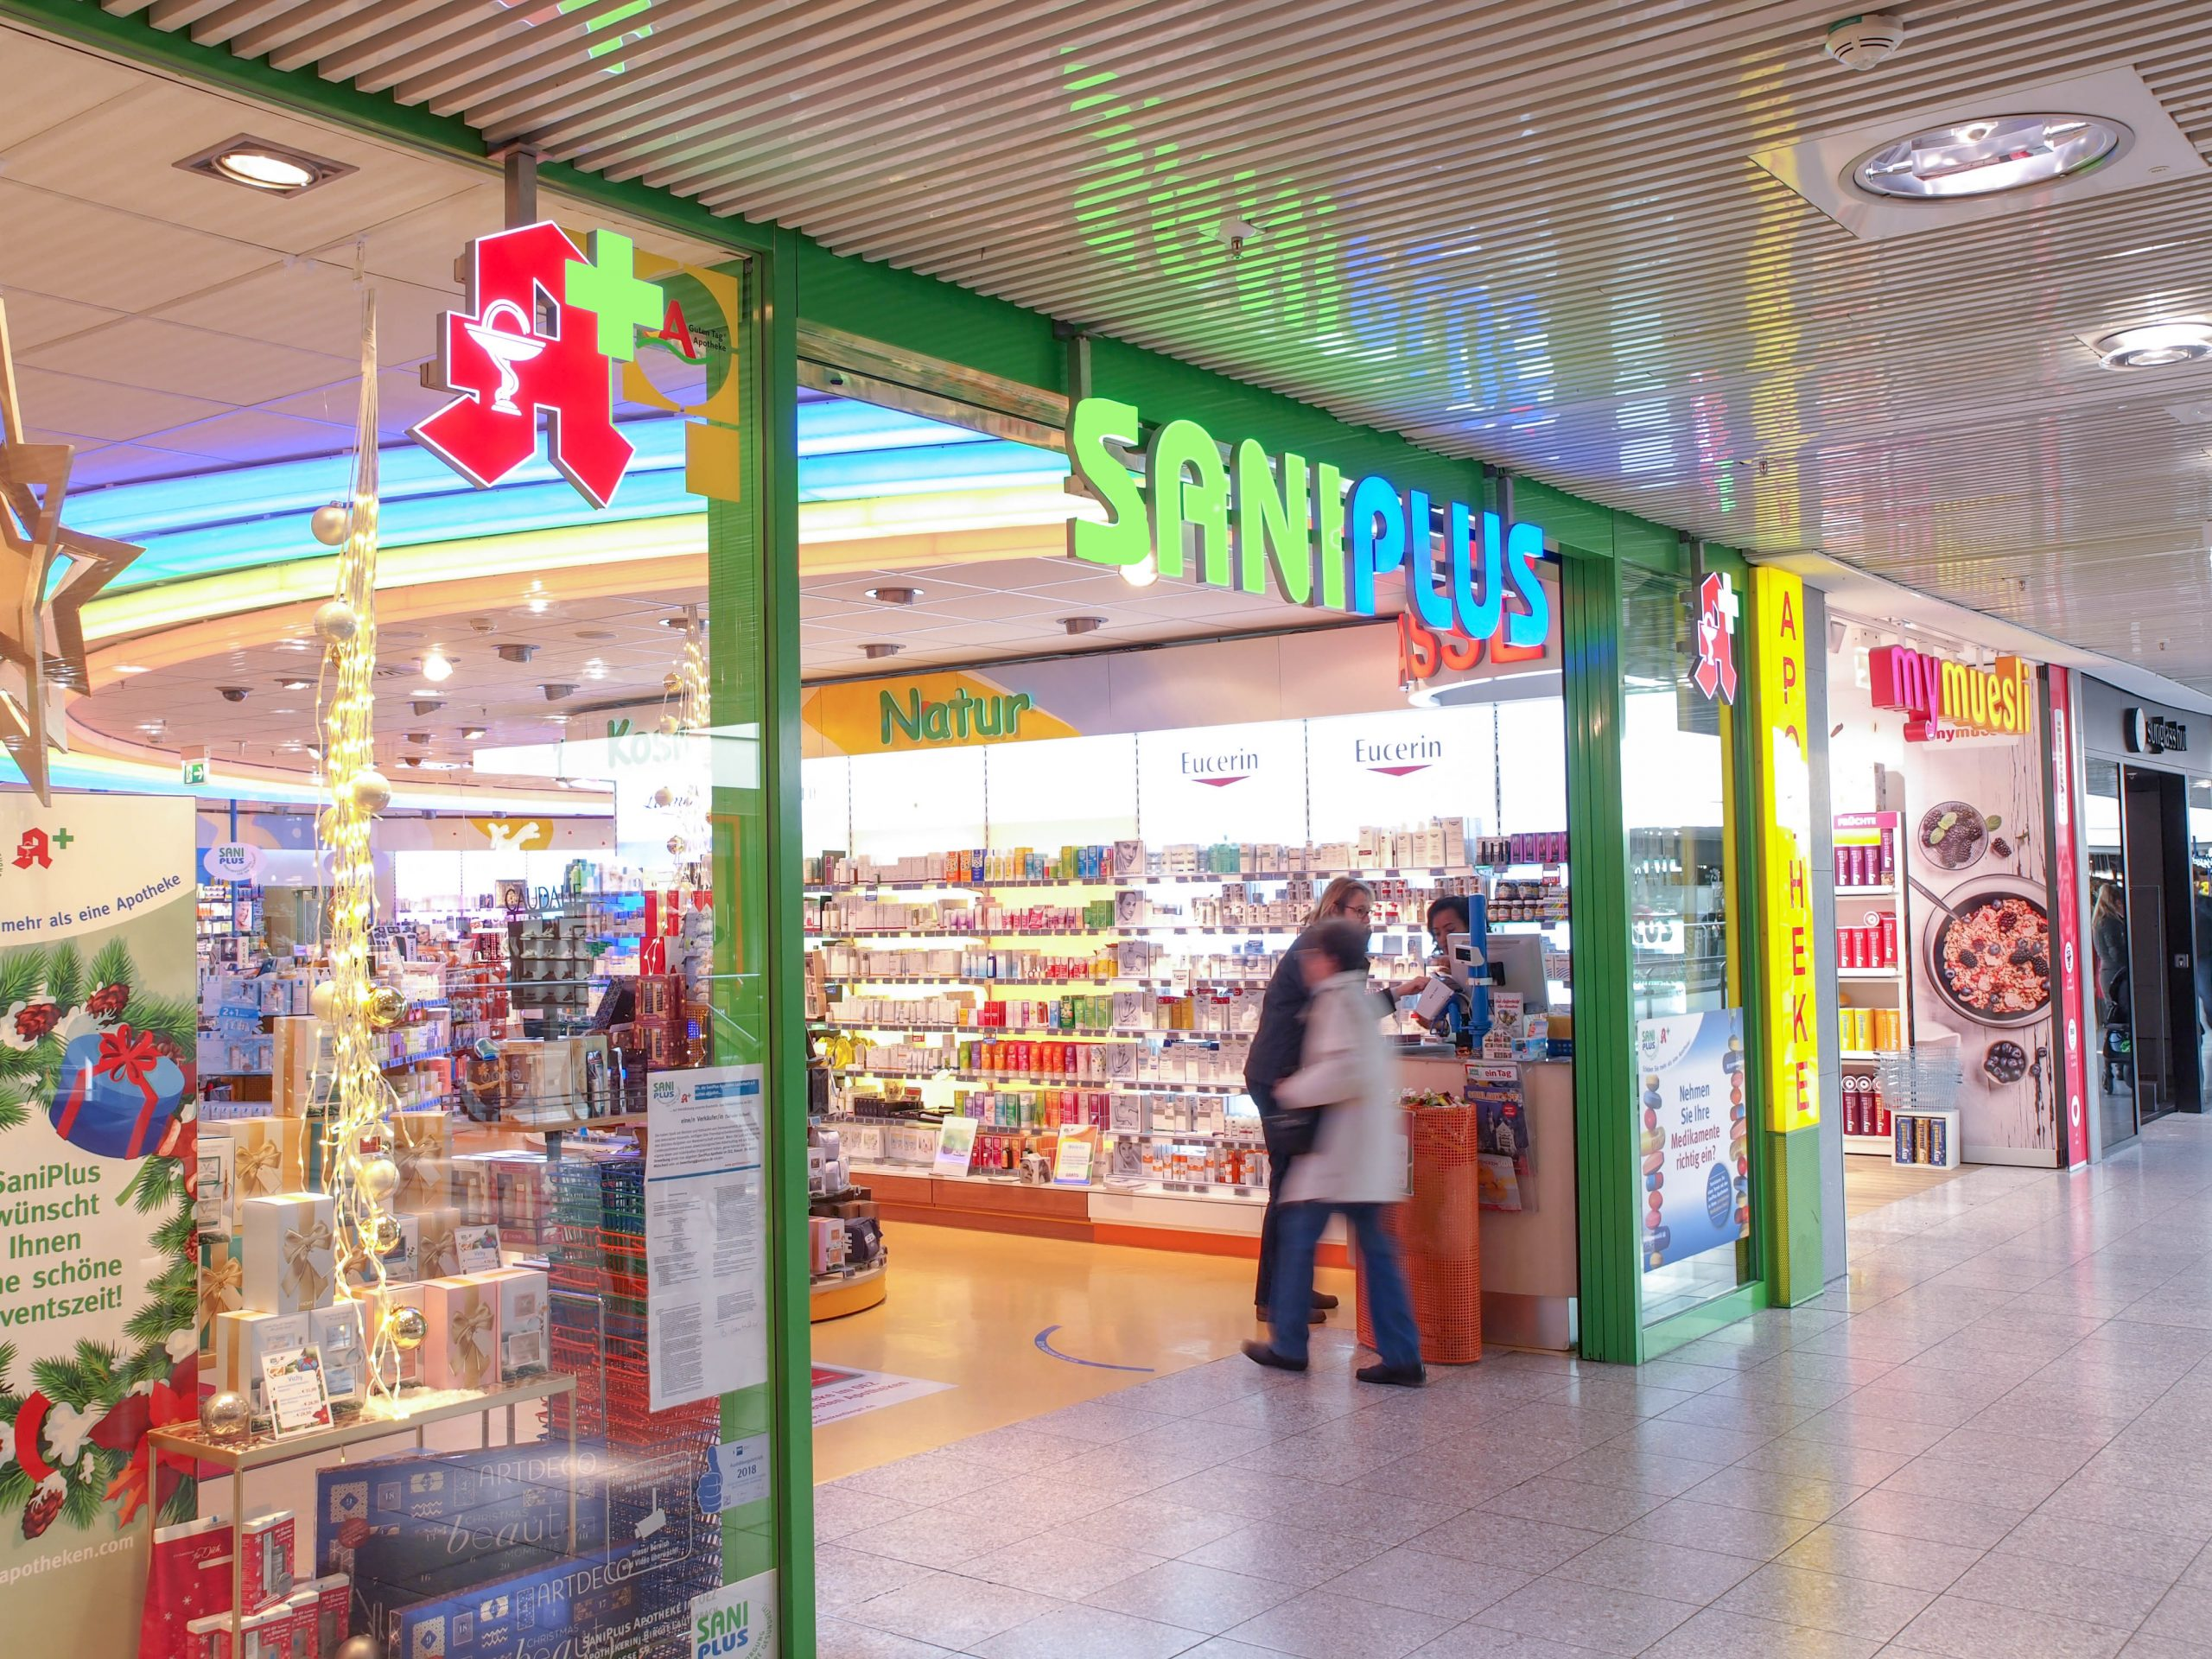 PhiP bei SaniPlus in München!